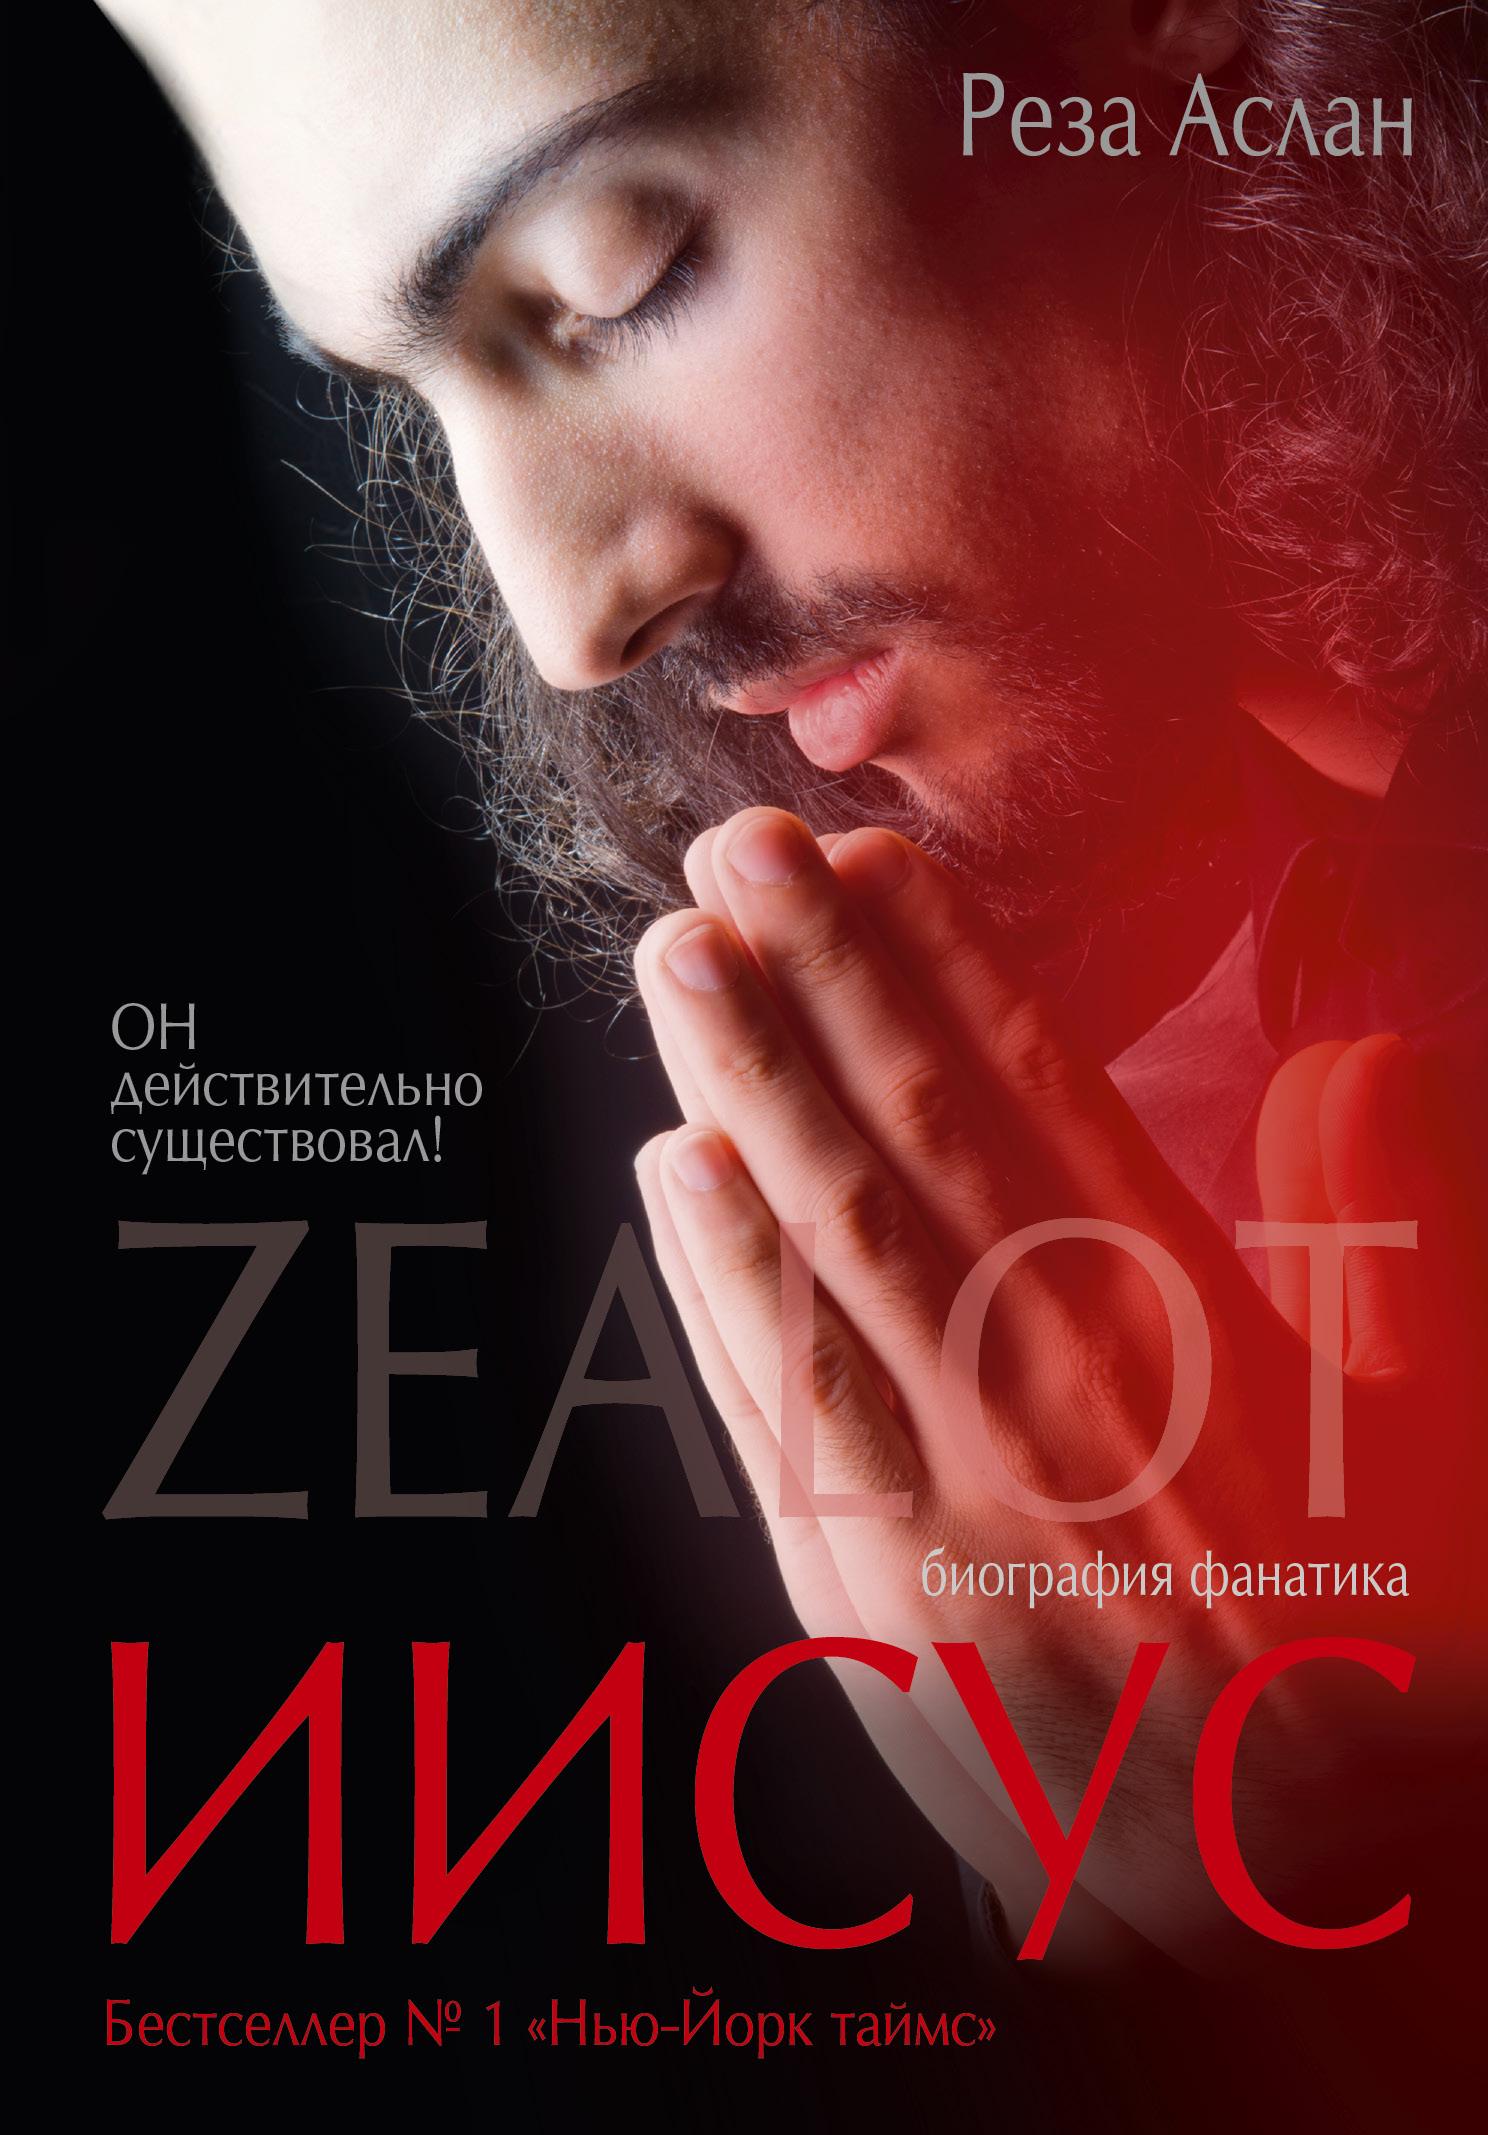 Аслан Реза Zealot. Иисус: биография фанатика zealot h1bluetooth sport earphone